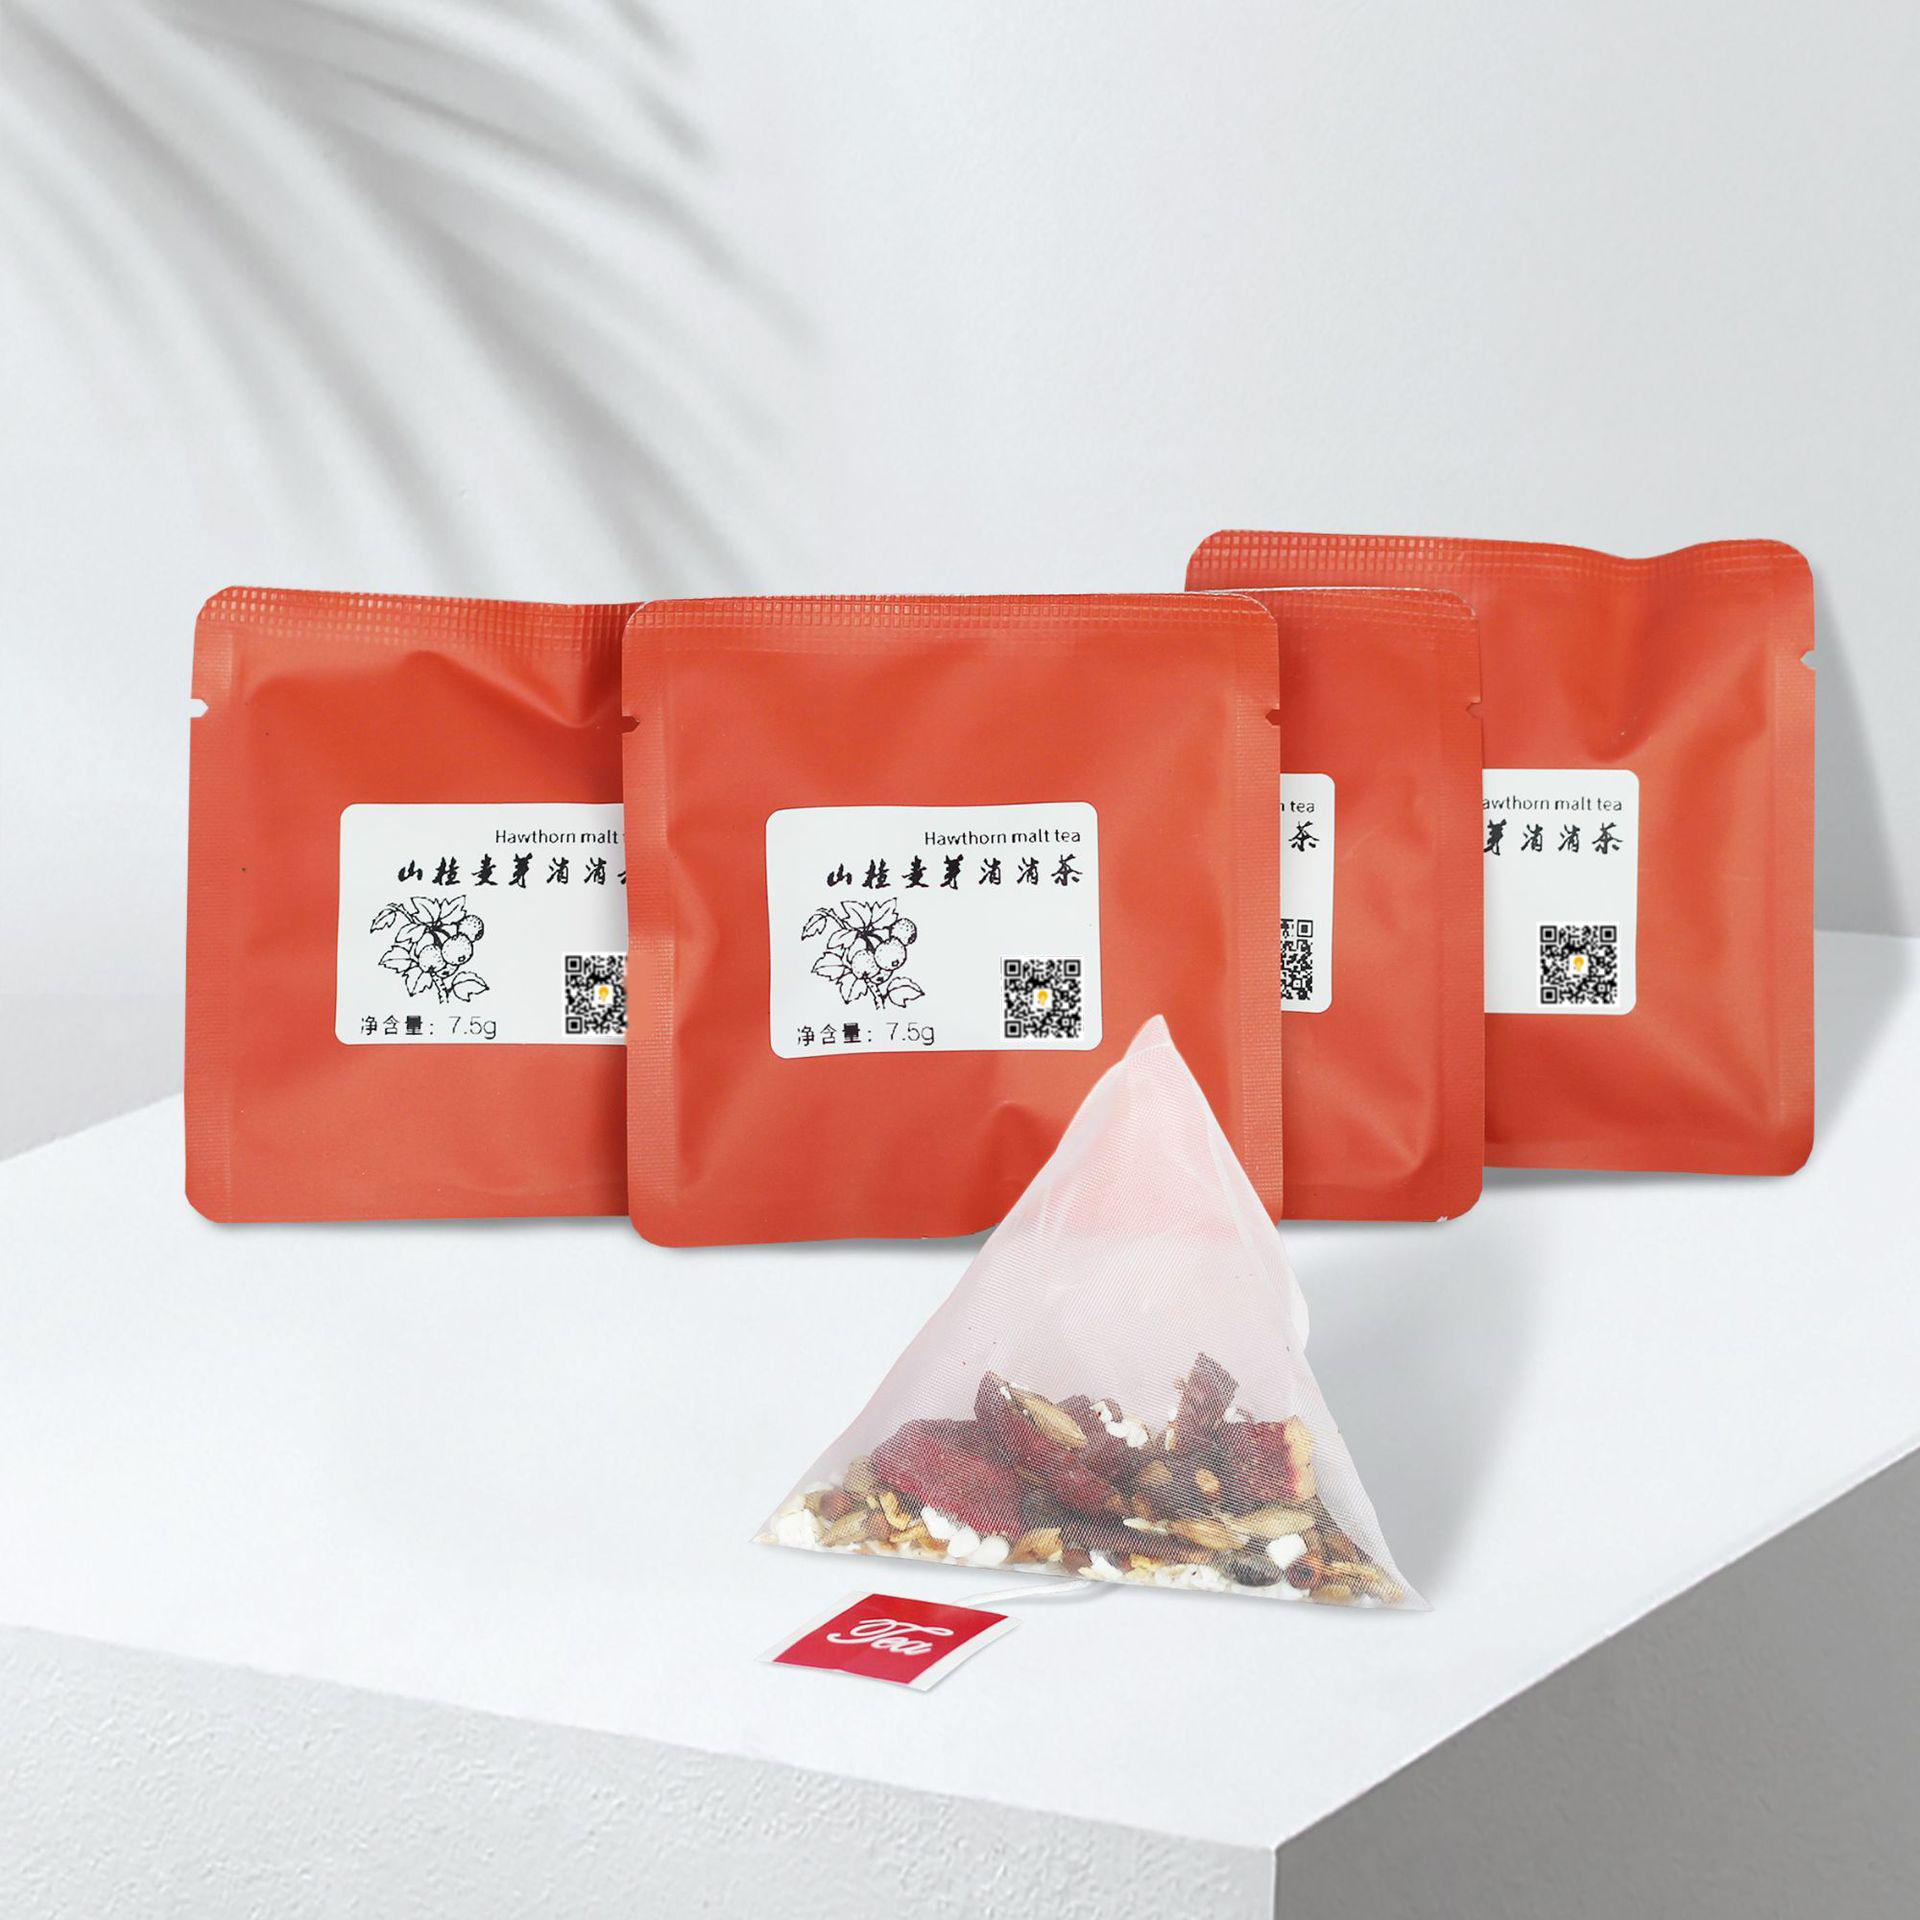 2021 Wholesale Hawthorn Organic Dandelion Root Chinese Herbal Tea Bags Aid Digestion Heart Private Label Logo OEM - 4uTea | 4uTea.com